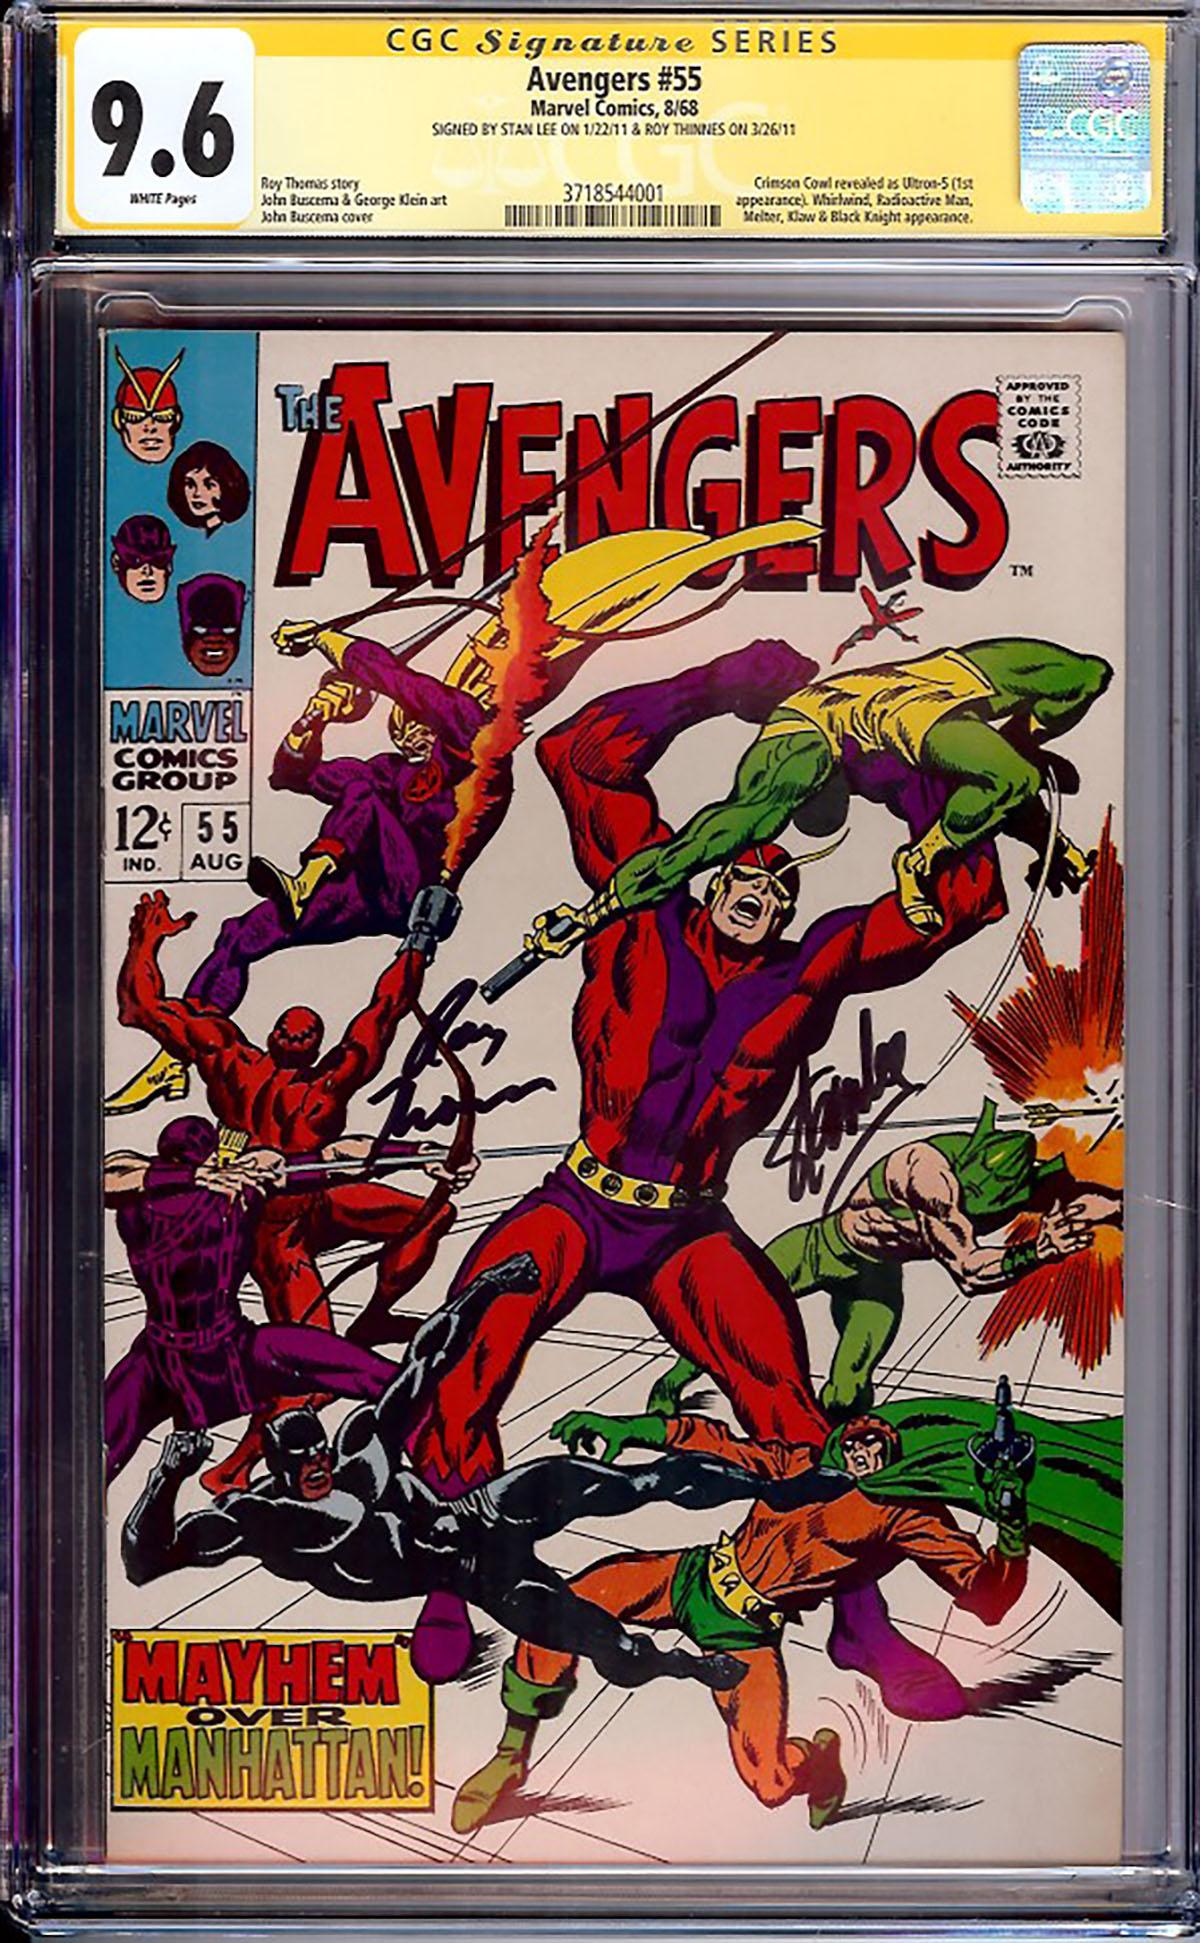 Avengers #55 CGC 9.6 w CGC Signature SERIES